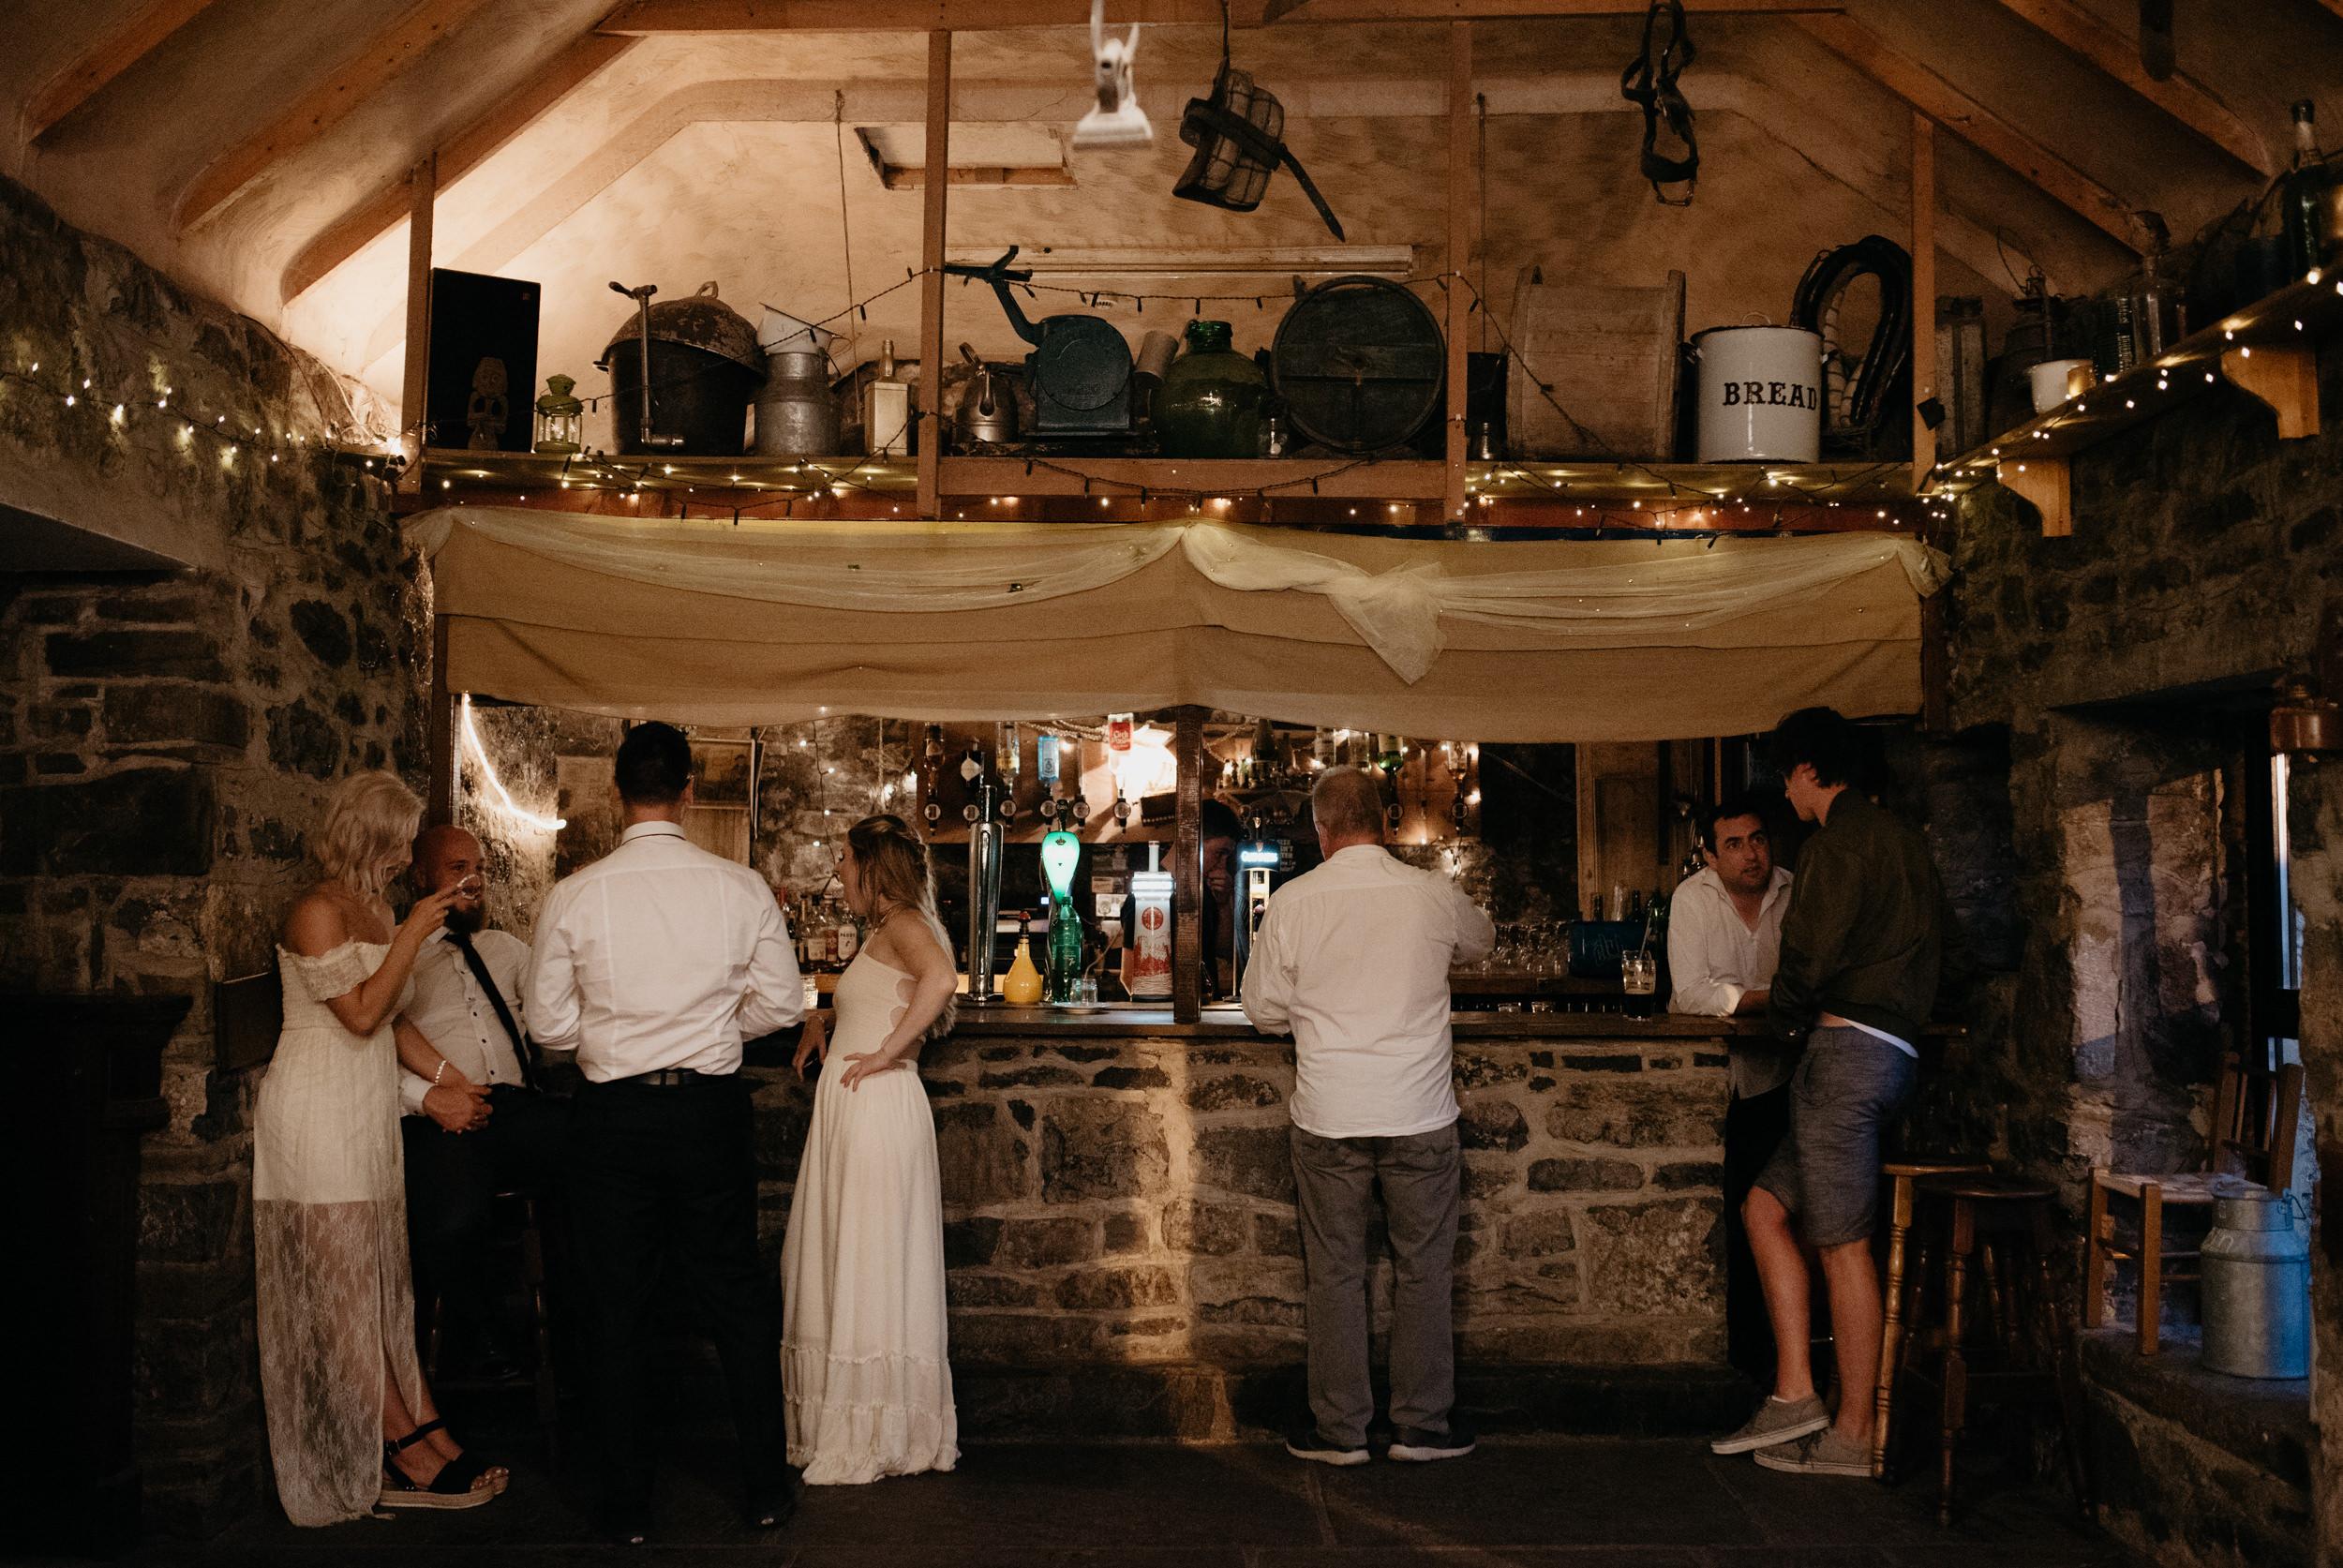 Wedding reception at Vaughan's Pub in Kilfenora. Ireland wedding photographer. County Clare elopement photographer.